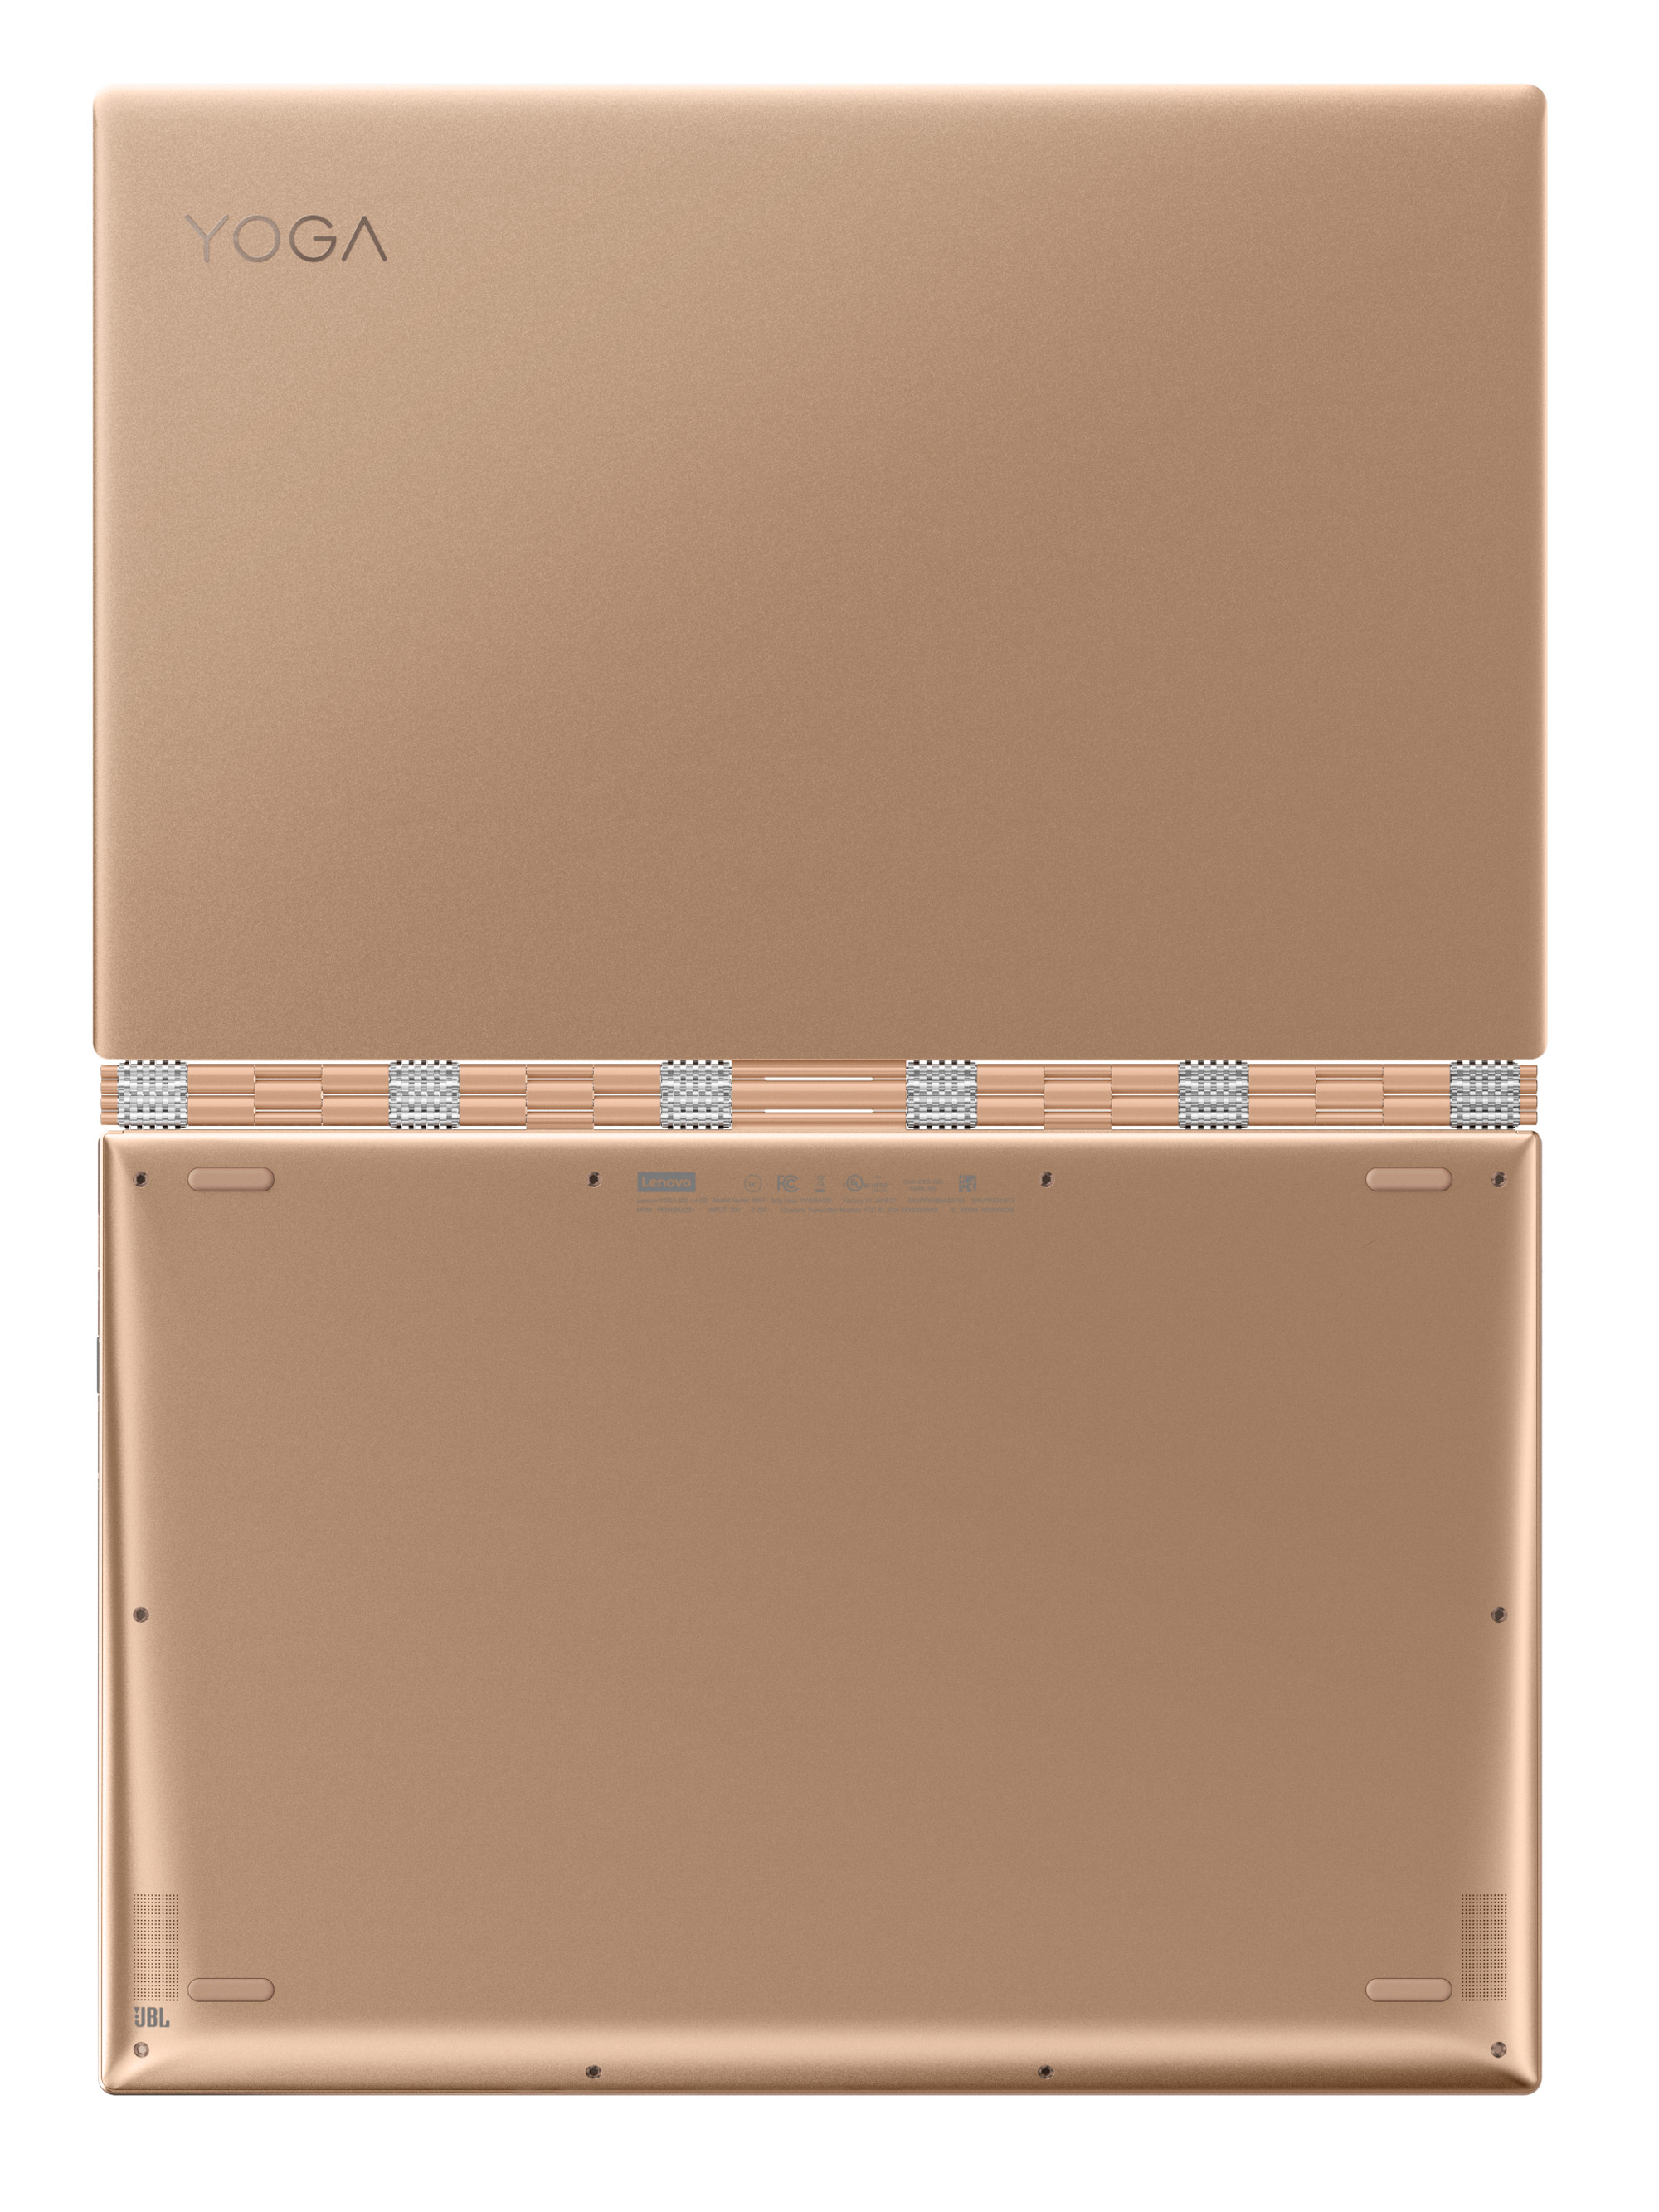 Фото  Ультрабук Lenovo Yoga 920 Copper (80Y700BSRA)